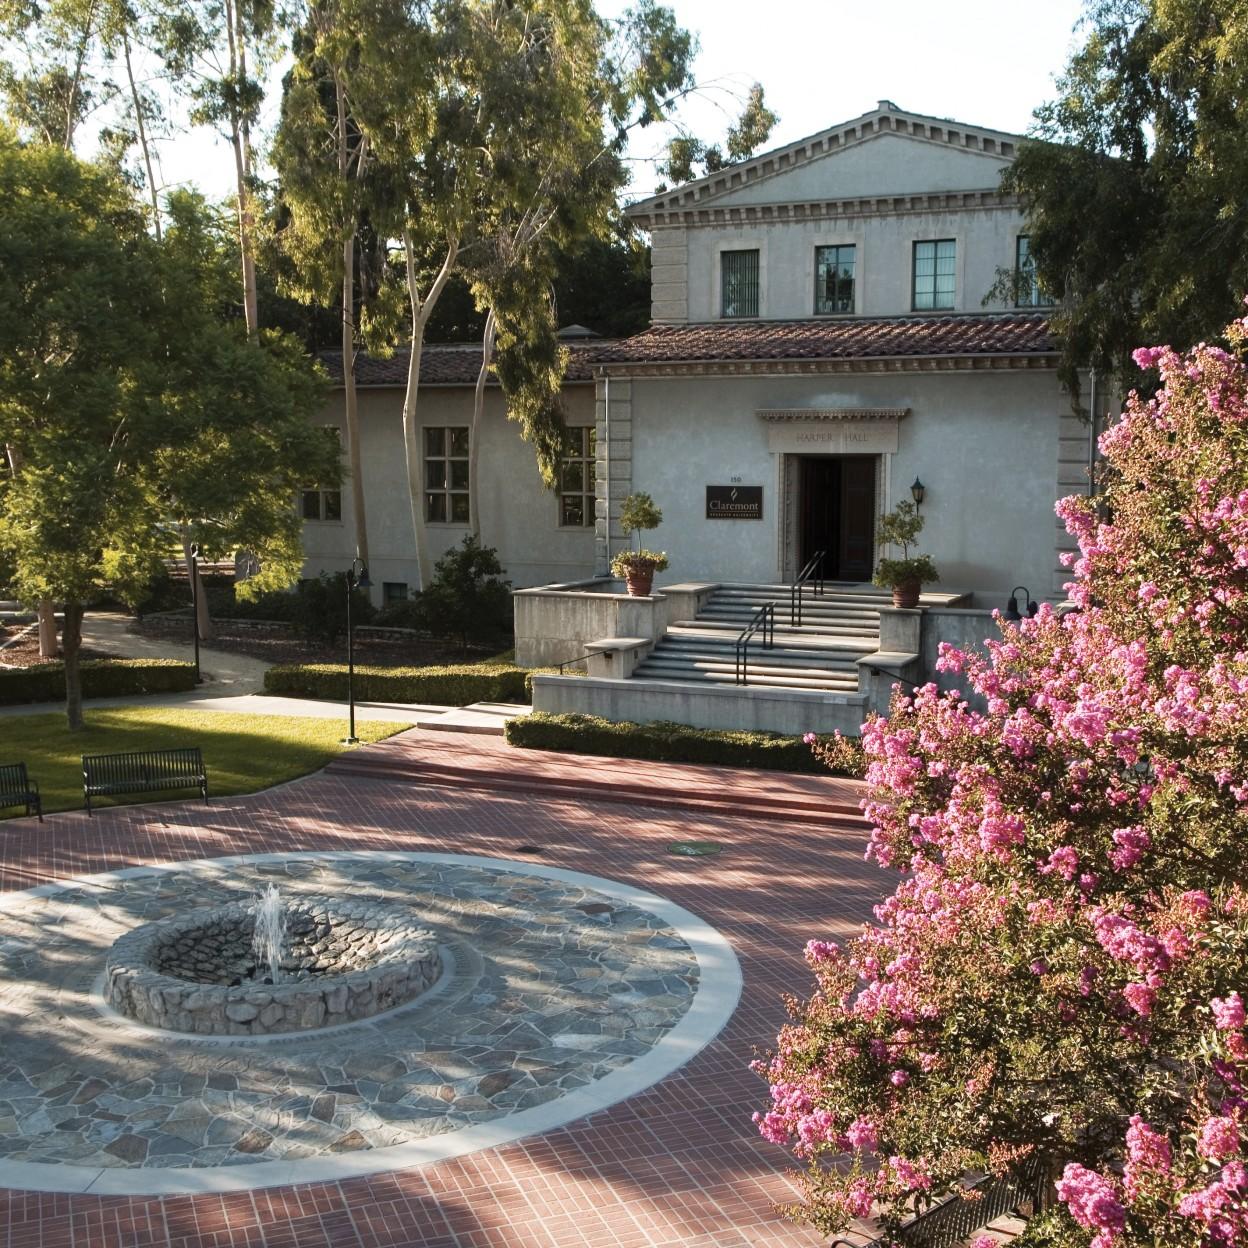 Sotheby's Institute, Los Angeles: Drucker in the Arts